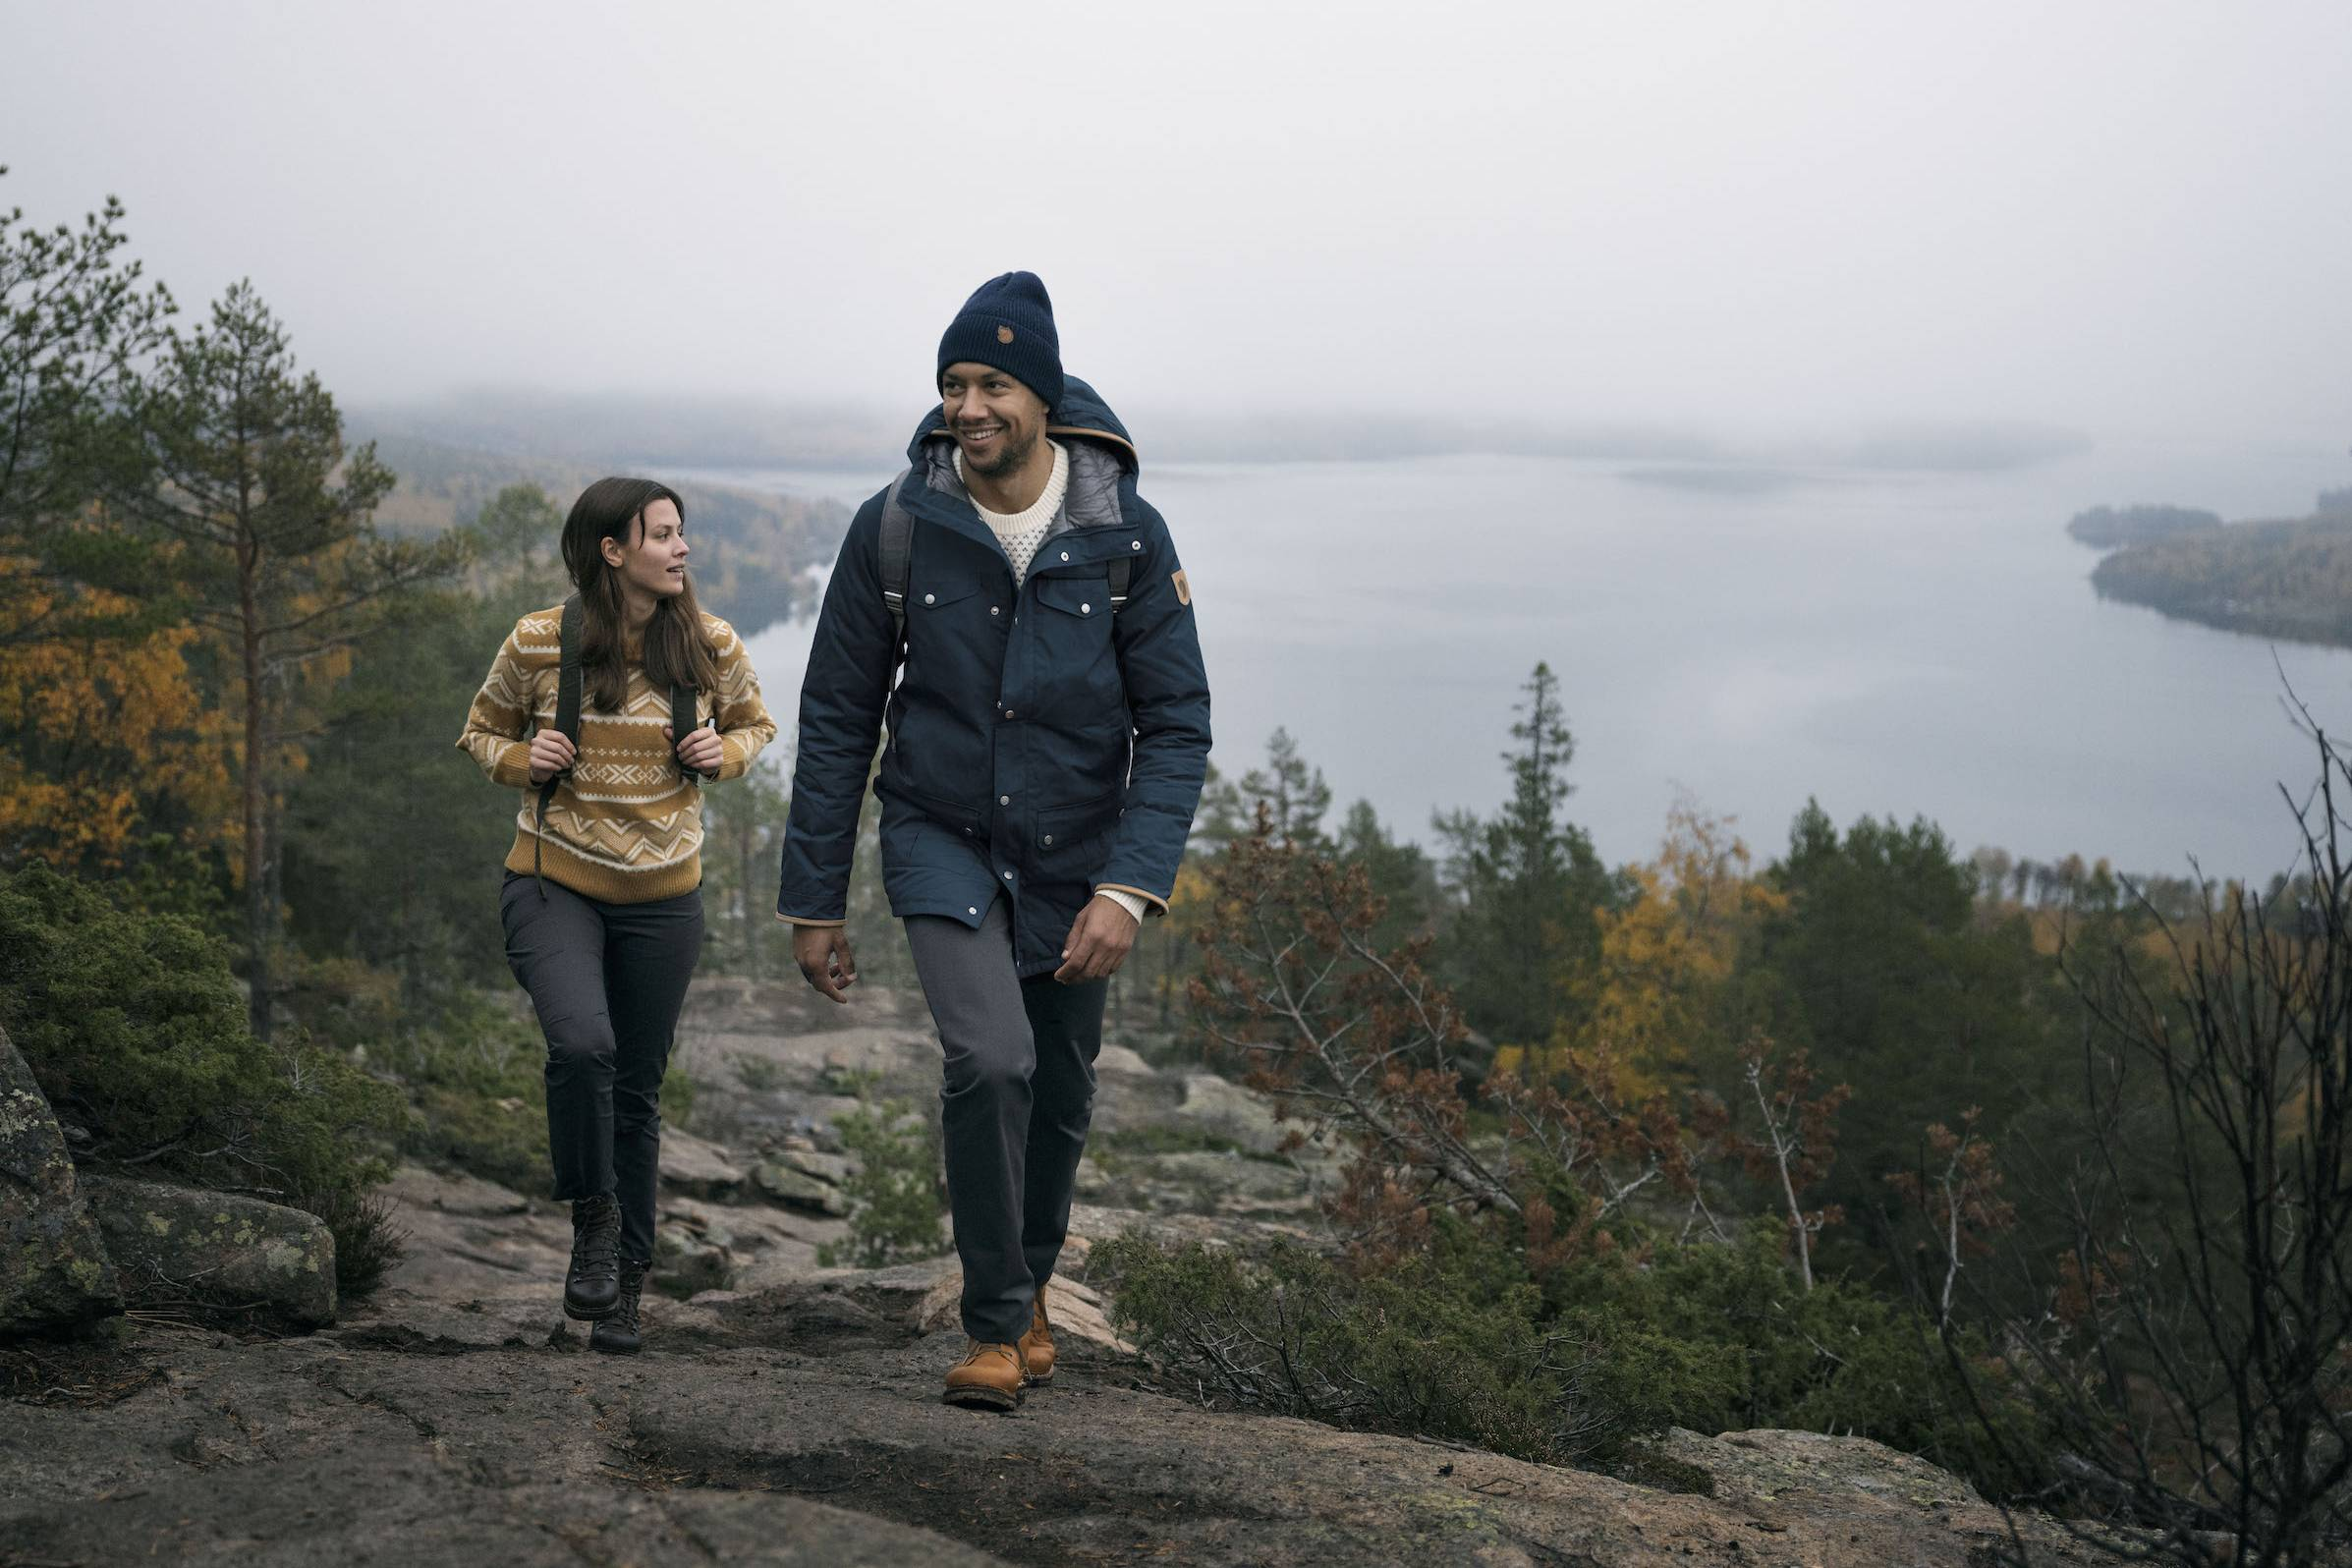 Fjallraven fall hiking